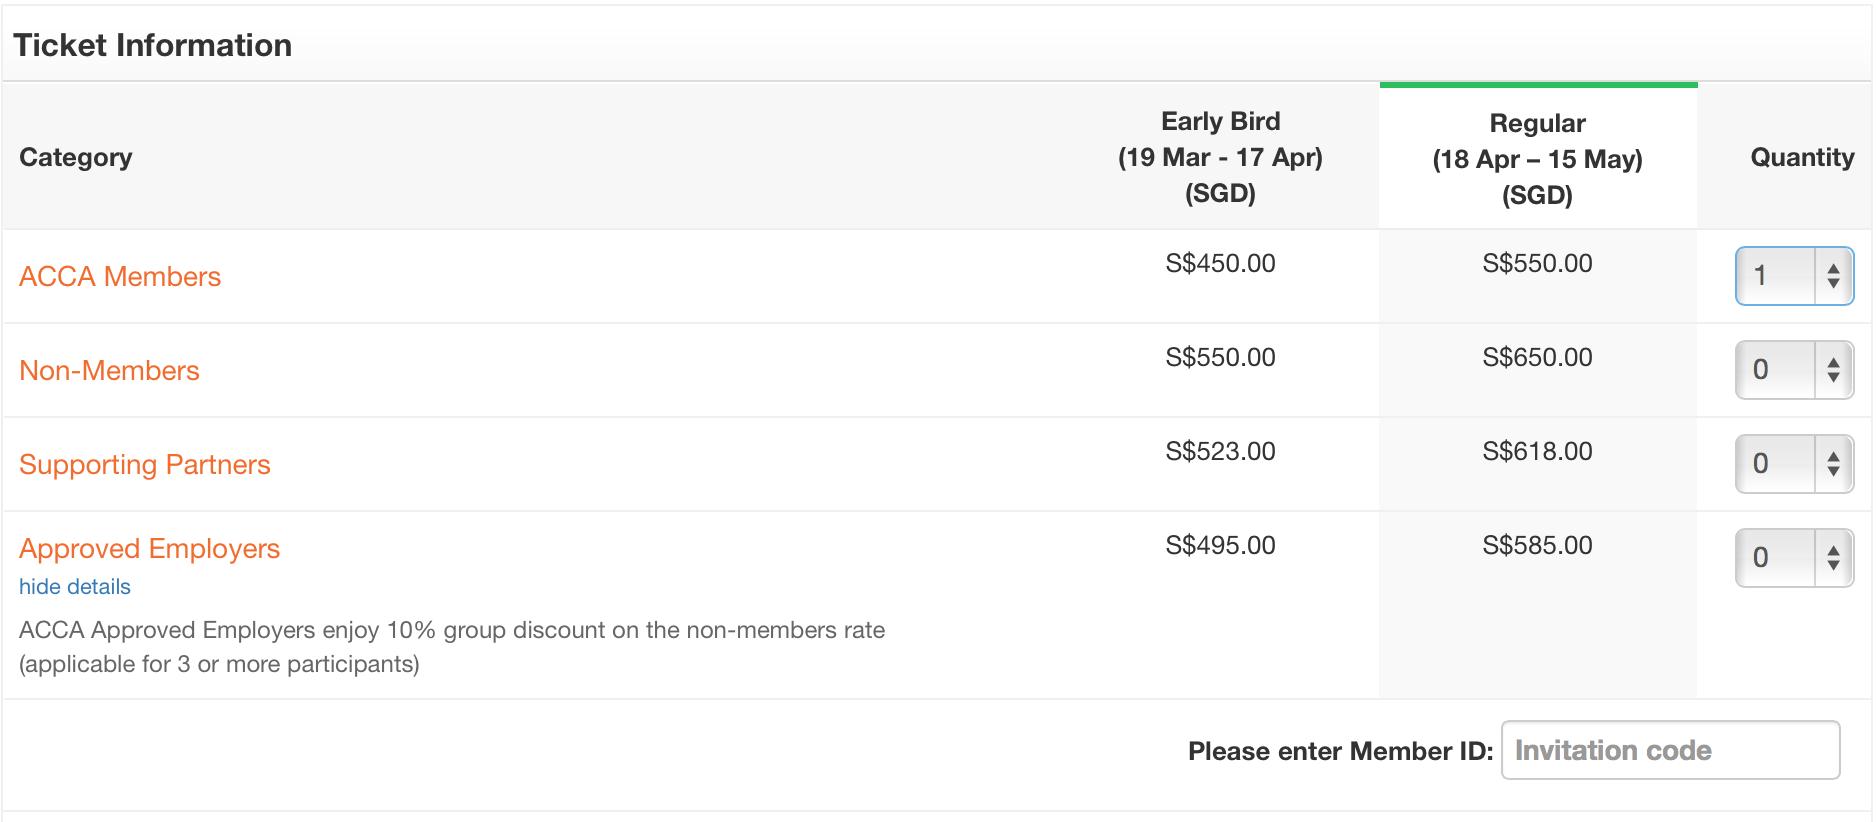 event registraiton ticket window - Invitation code for member pricing